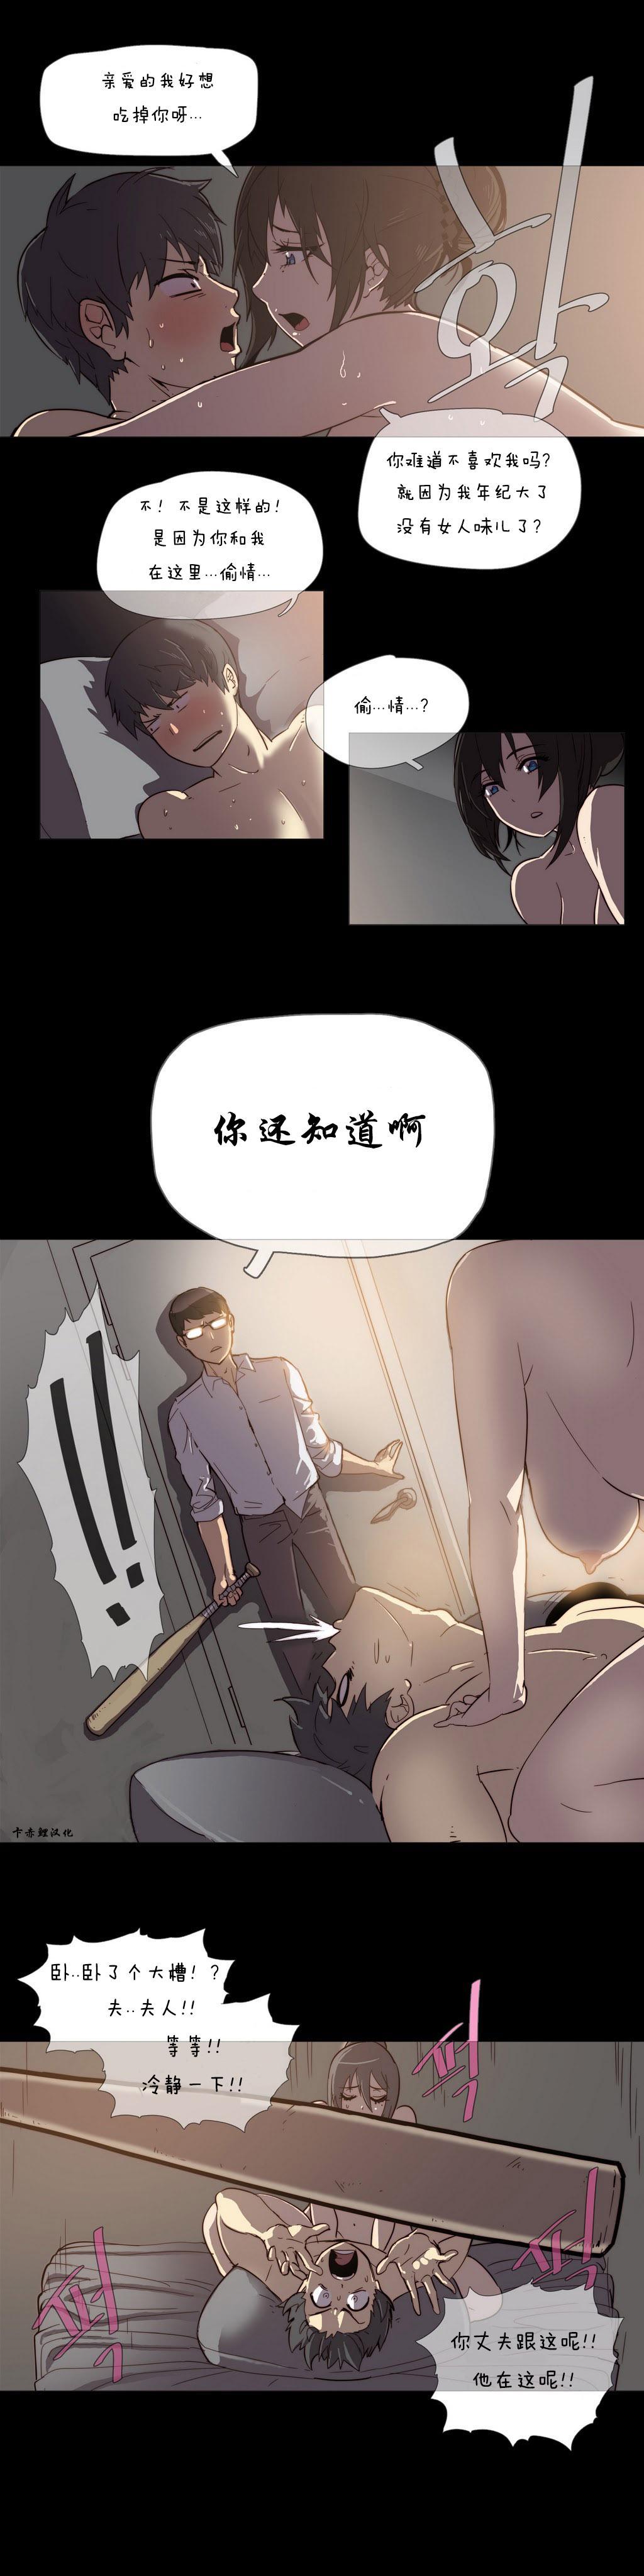 HouseHold Affairs 【卞赤鲤个人汉化】1~21话(持续更新中) 18